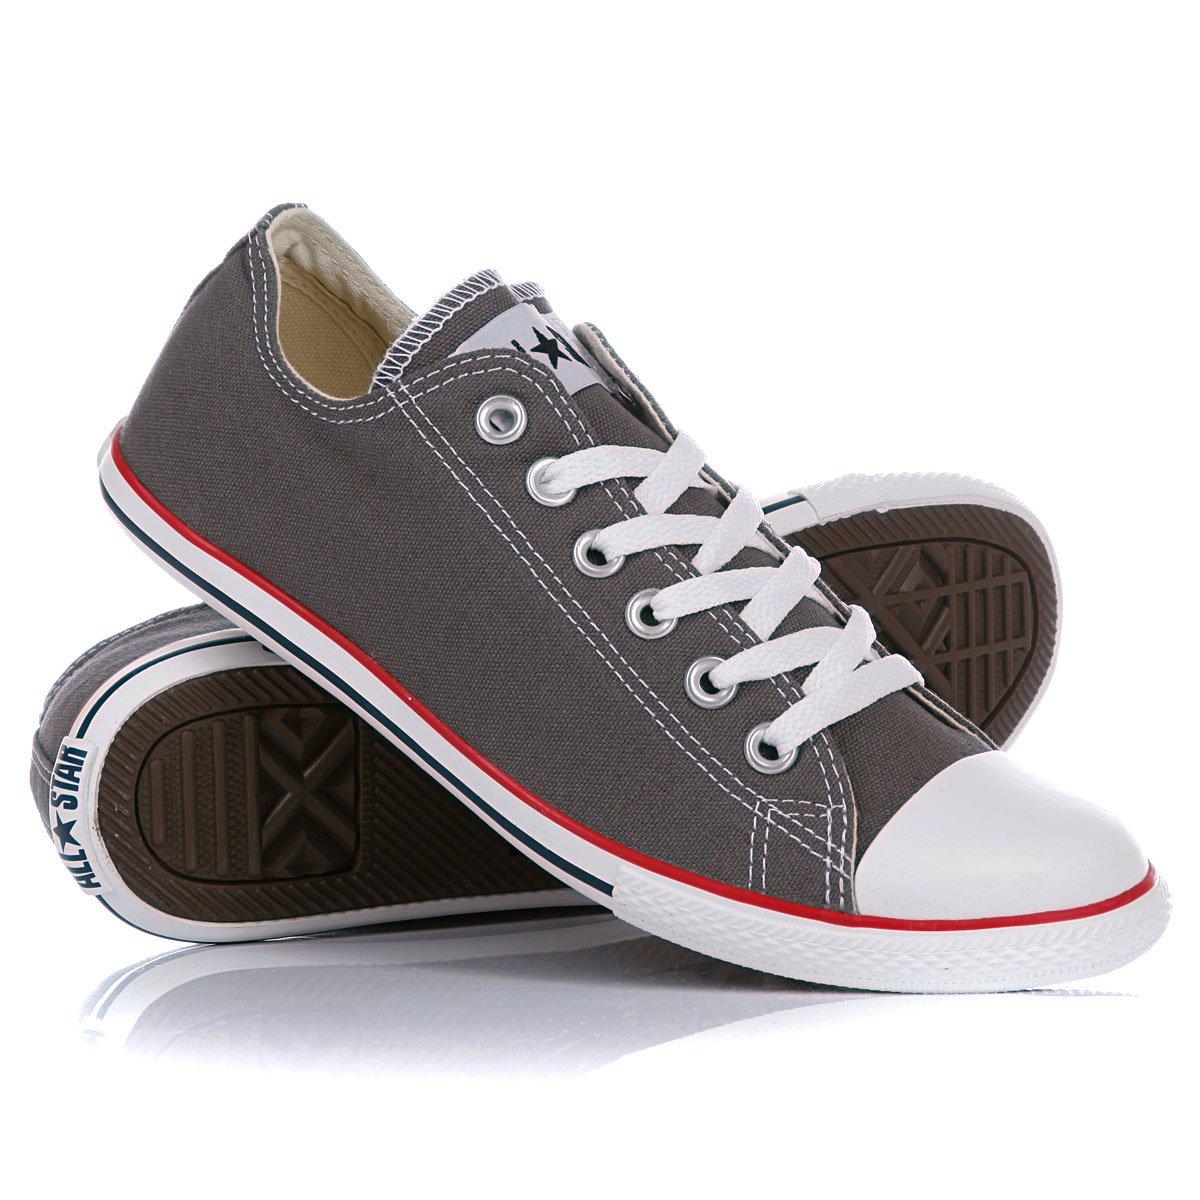 Купить кеды Converse Chuck Taylor Slim Ox Charcoal Red ... 4a399f69d5fdc